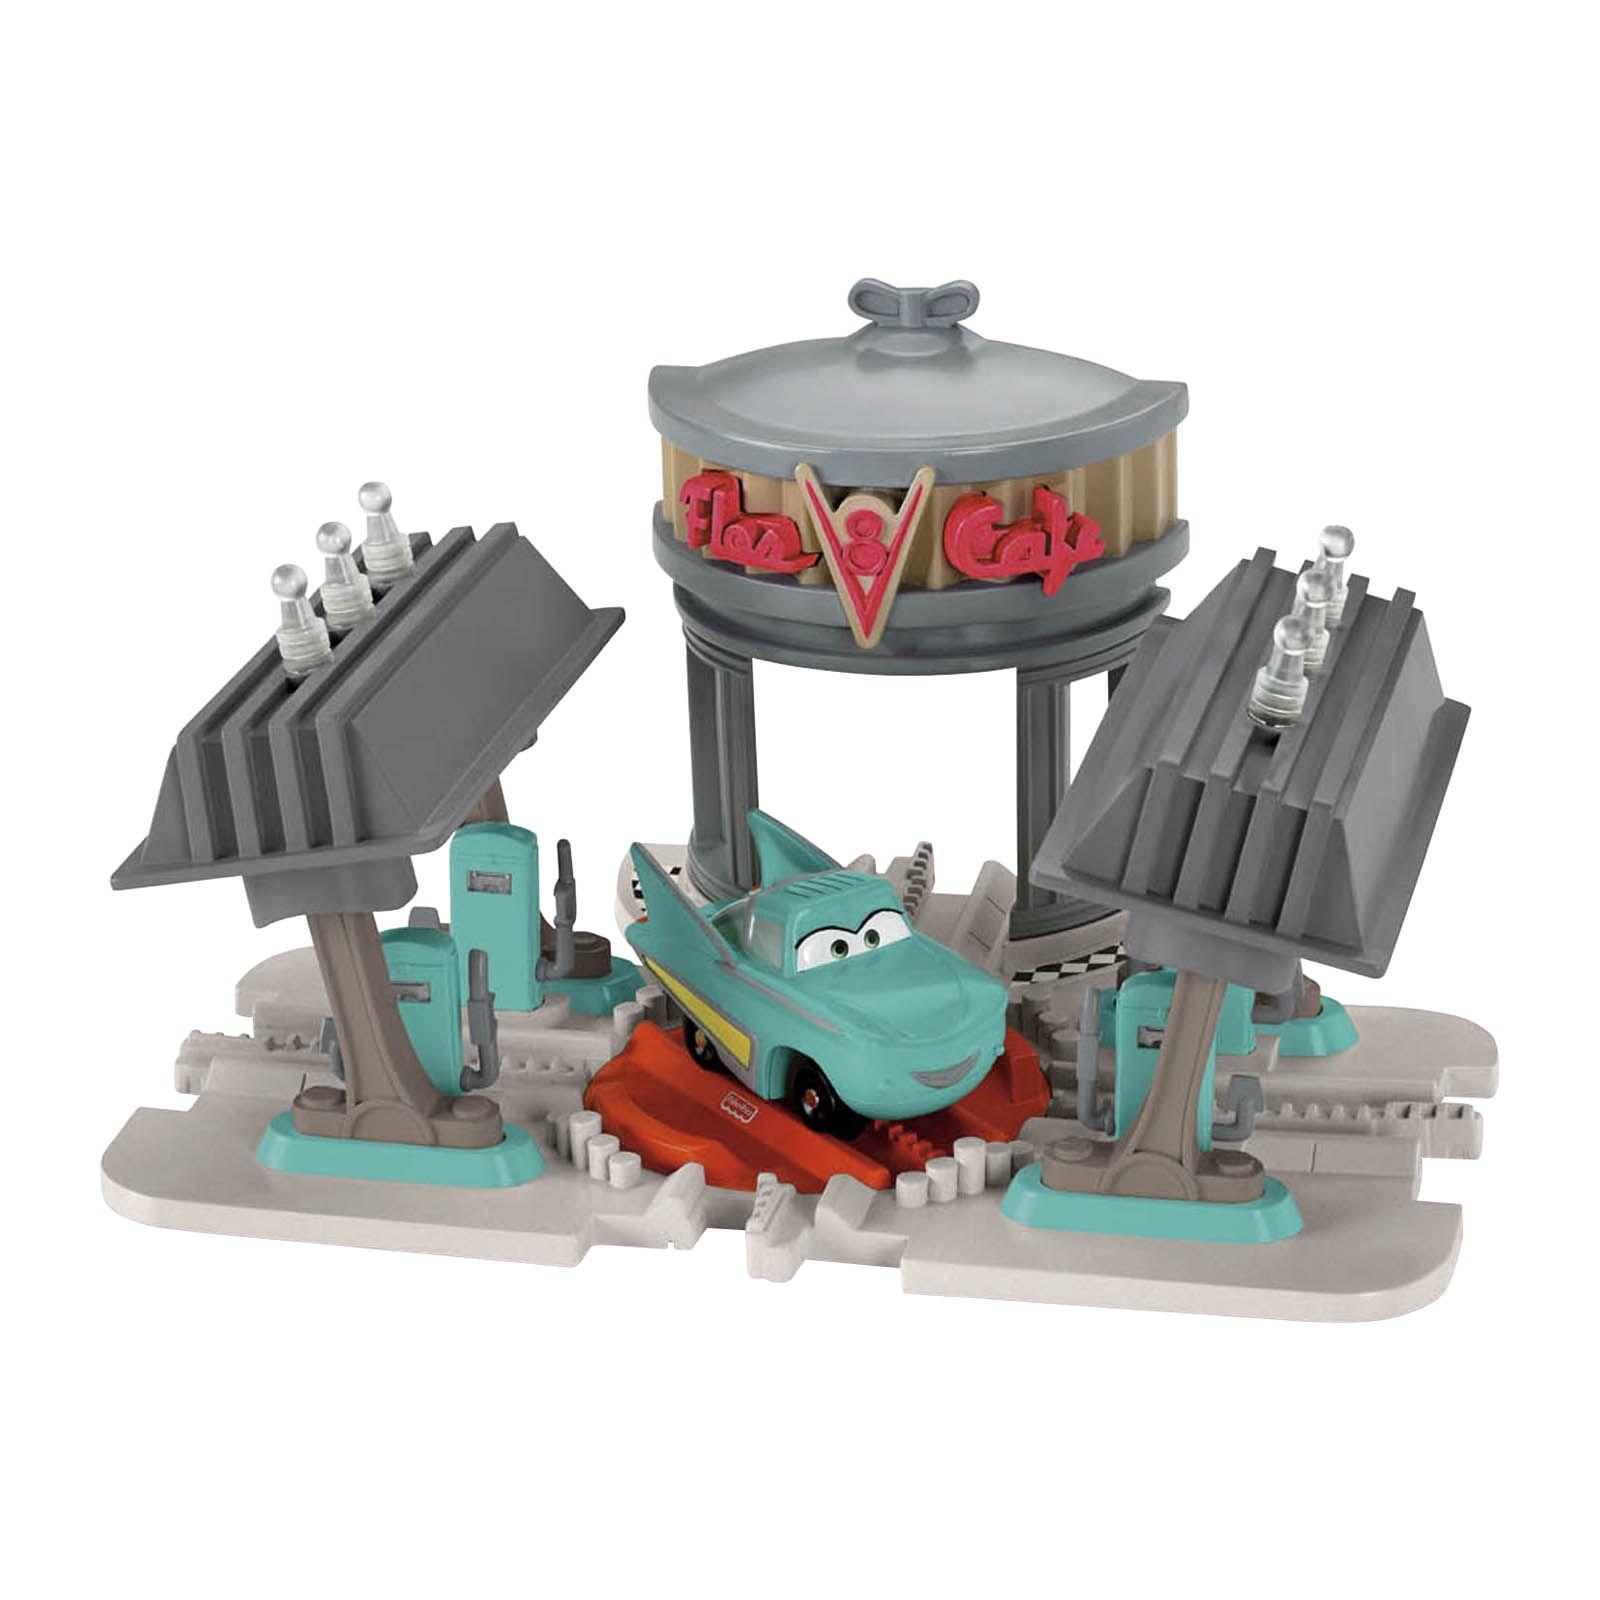 Geotrax Pixar Cars Flo' V8 Cafe - Toys